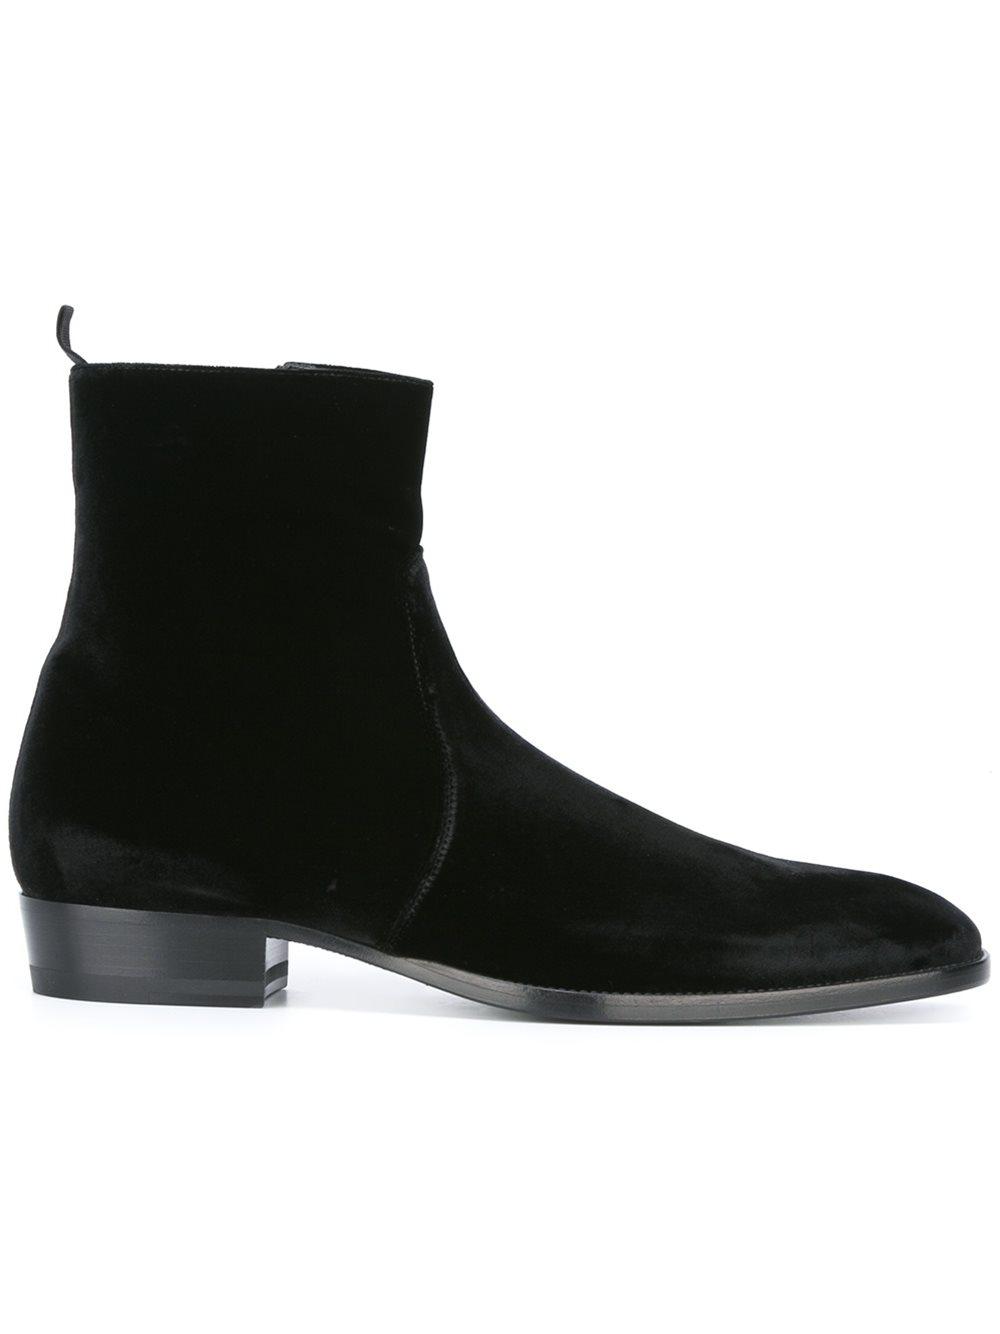 Men's Black Chelsea boots, Men black